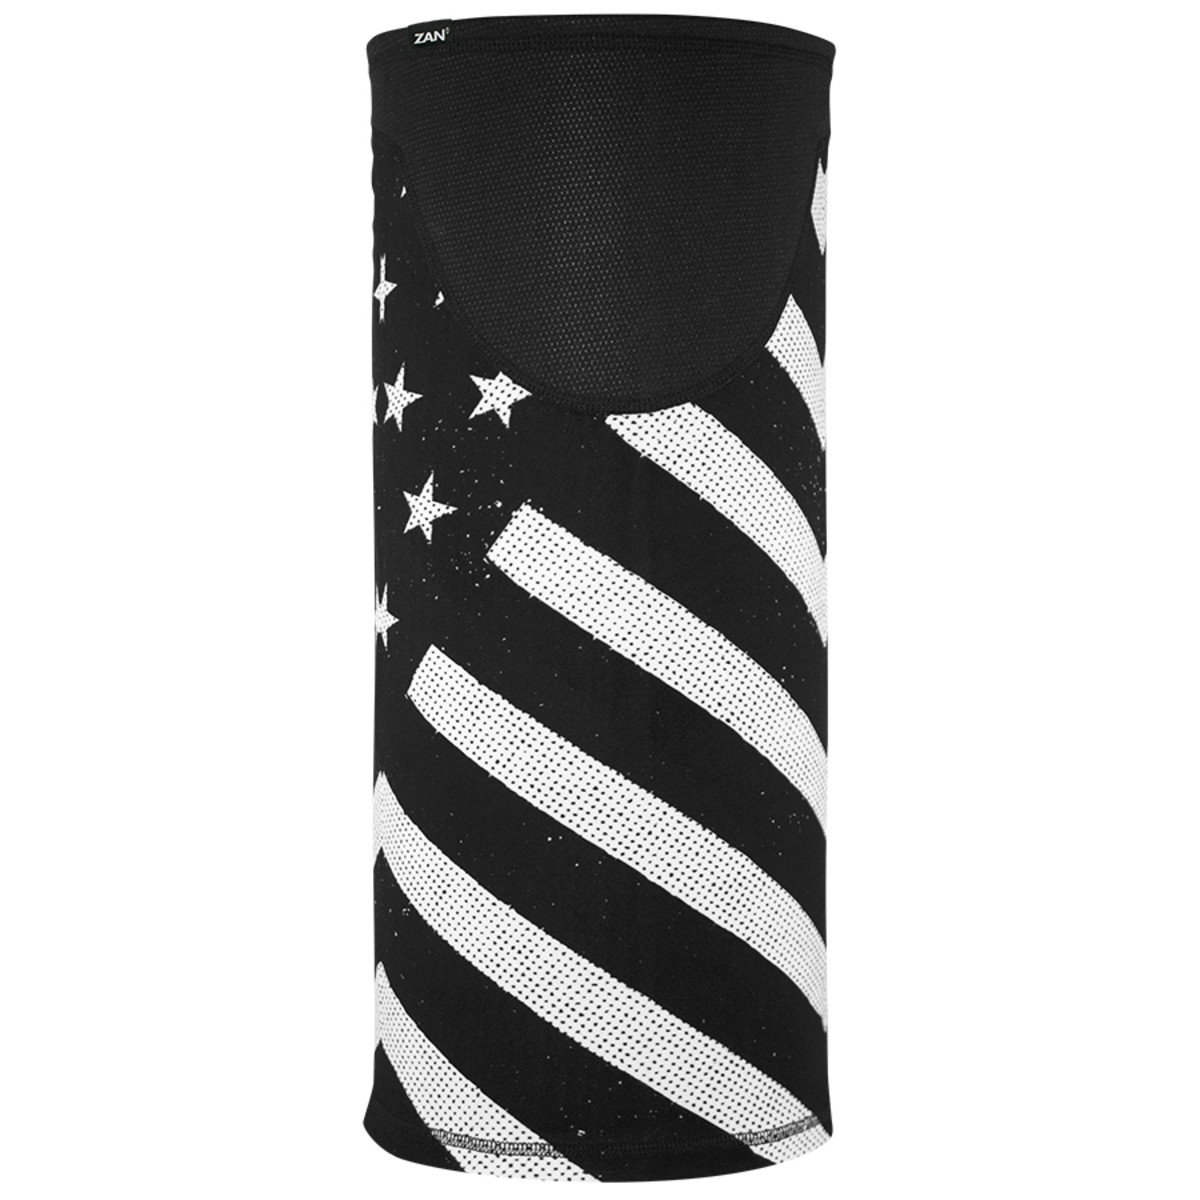 ZAN Motley Tube® SportFlex® Series Black & White Flag